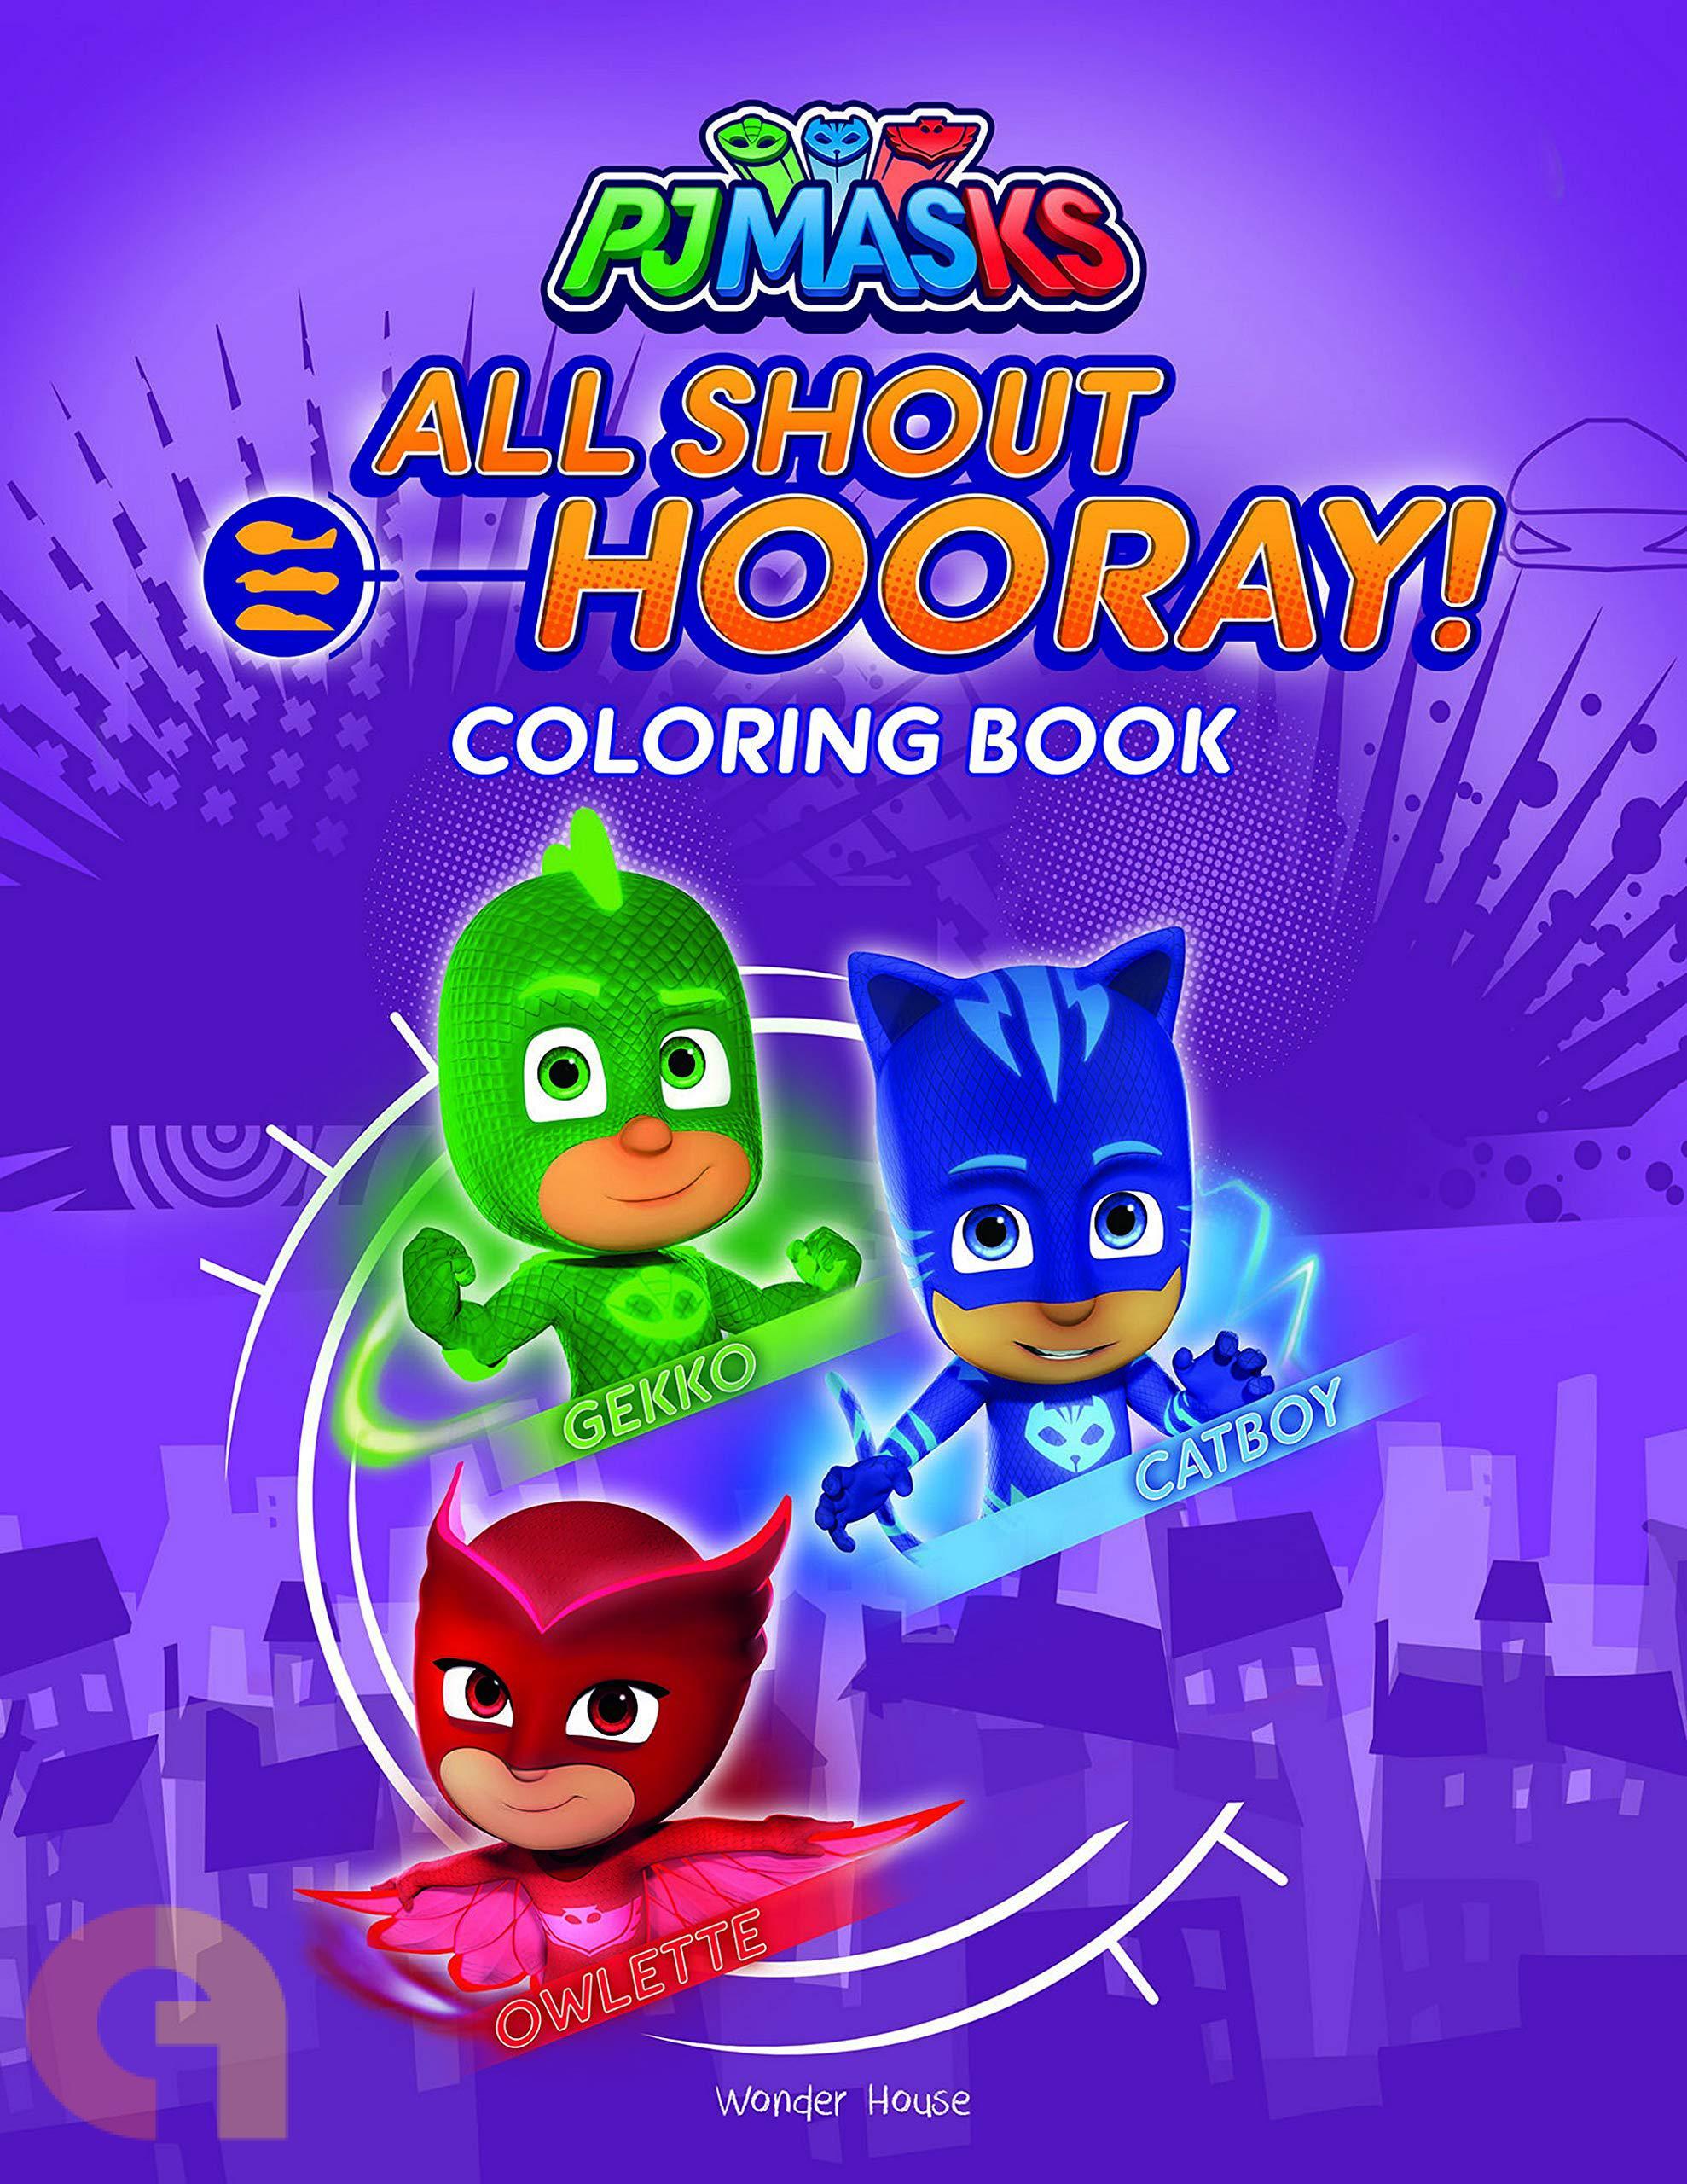 PJ Masks: All Shout Hooray